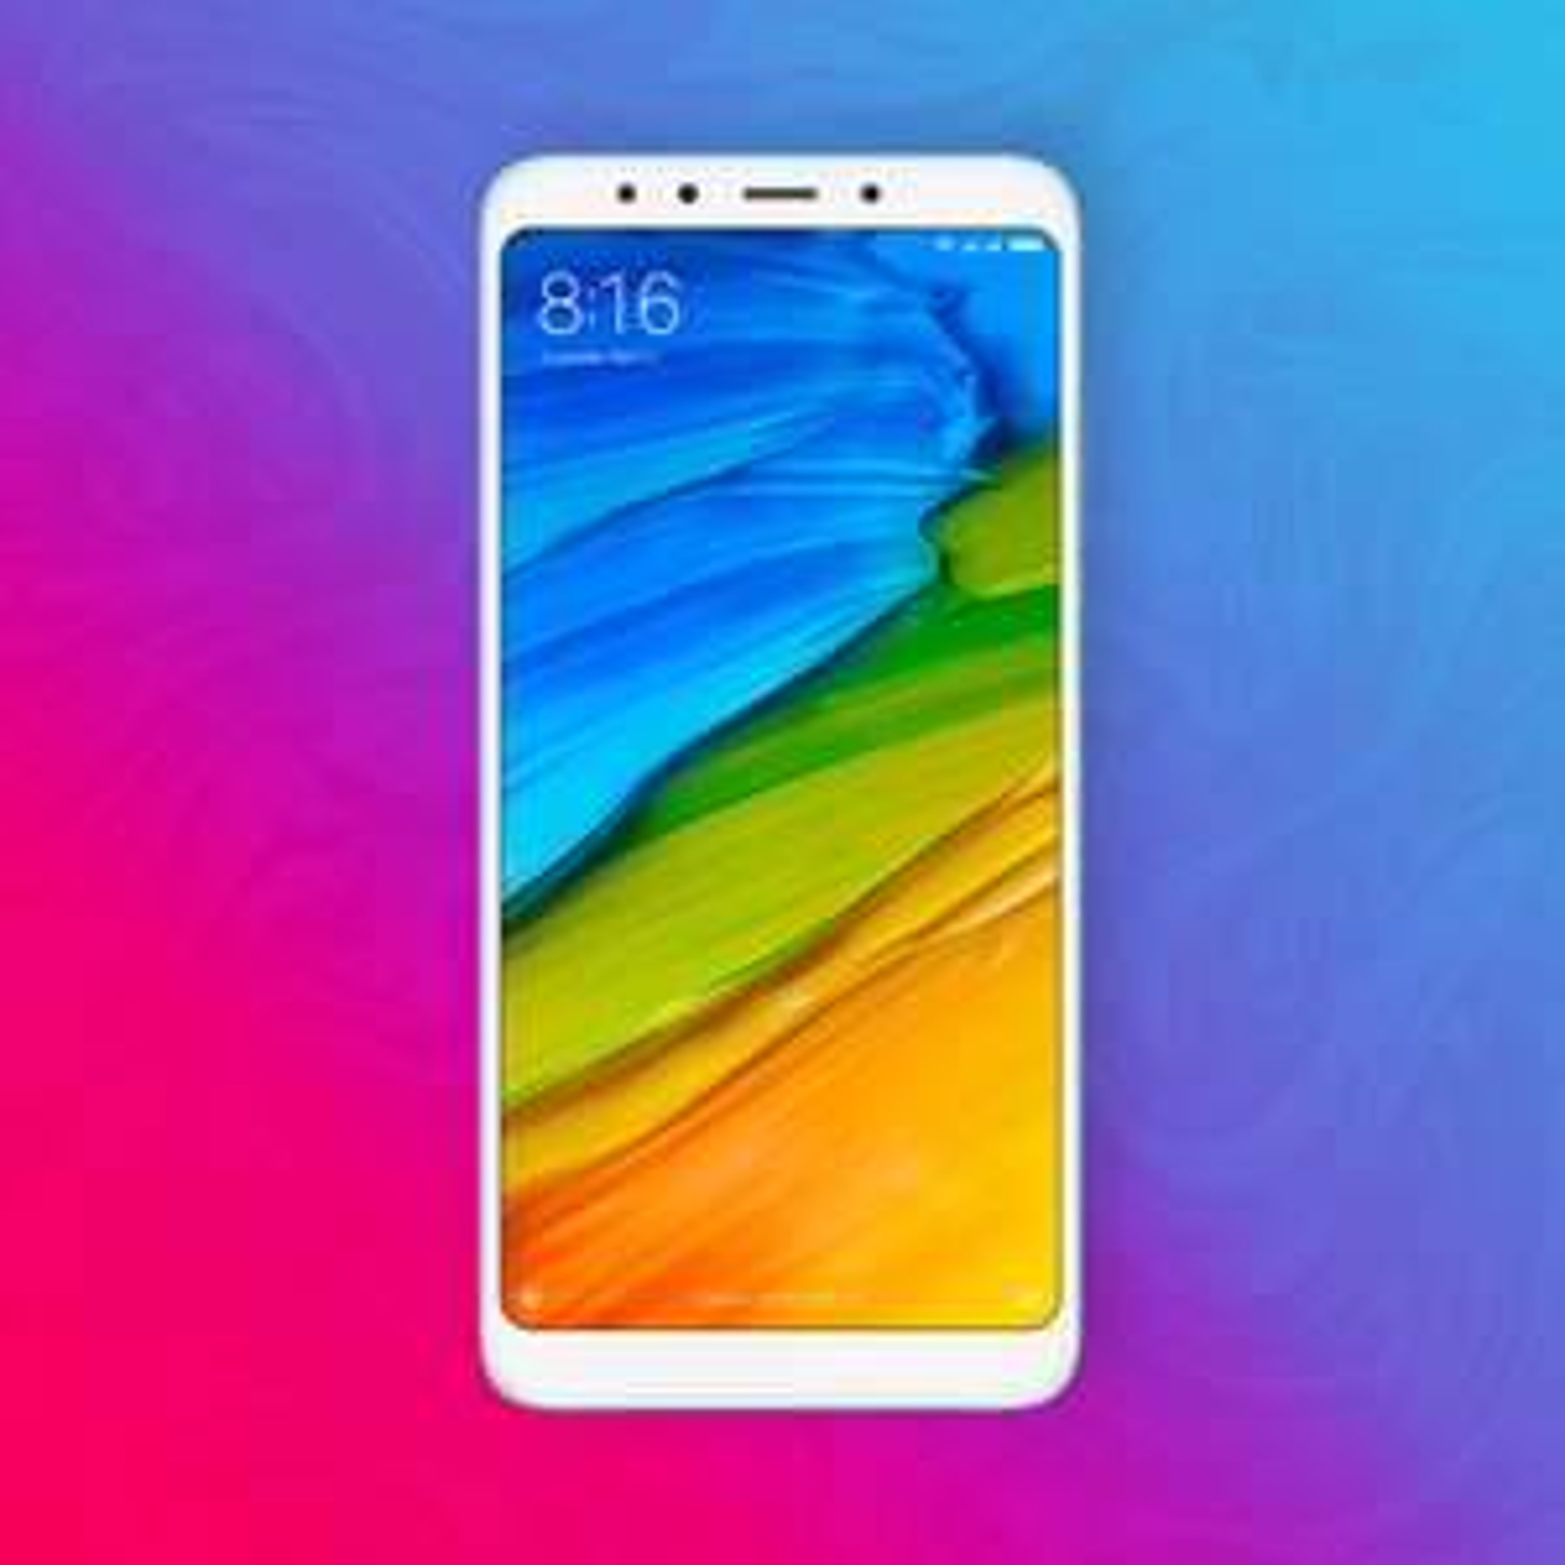 "Xiaomi Redmi 5 Plus 32/3GB - Snapdragon 625 - 5,99"" FHD Display - 4000mAh Akku - Metallgehäuse | Versand aus Frankreich"